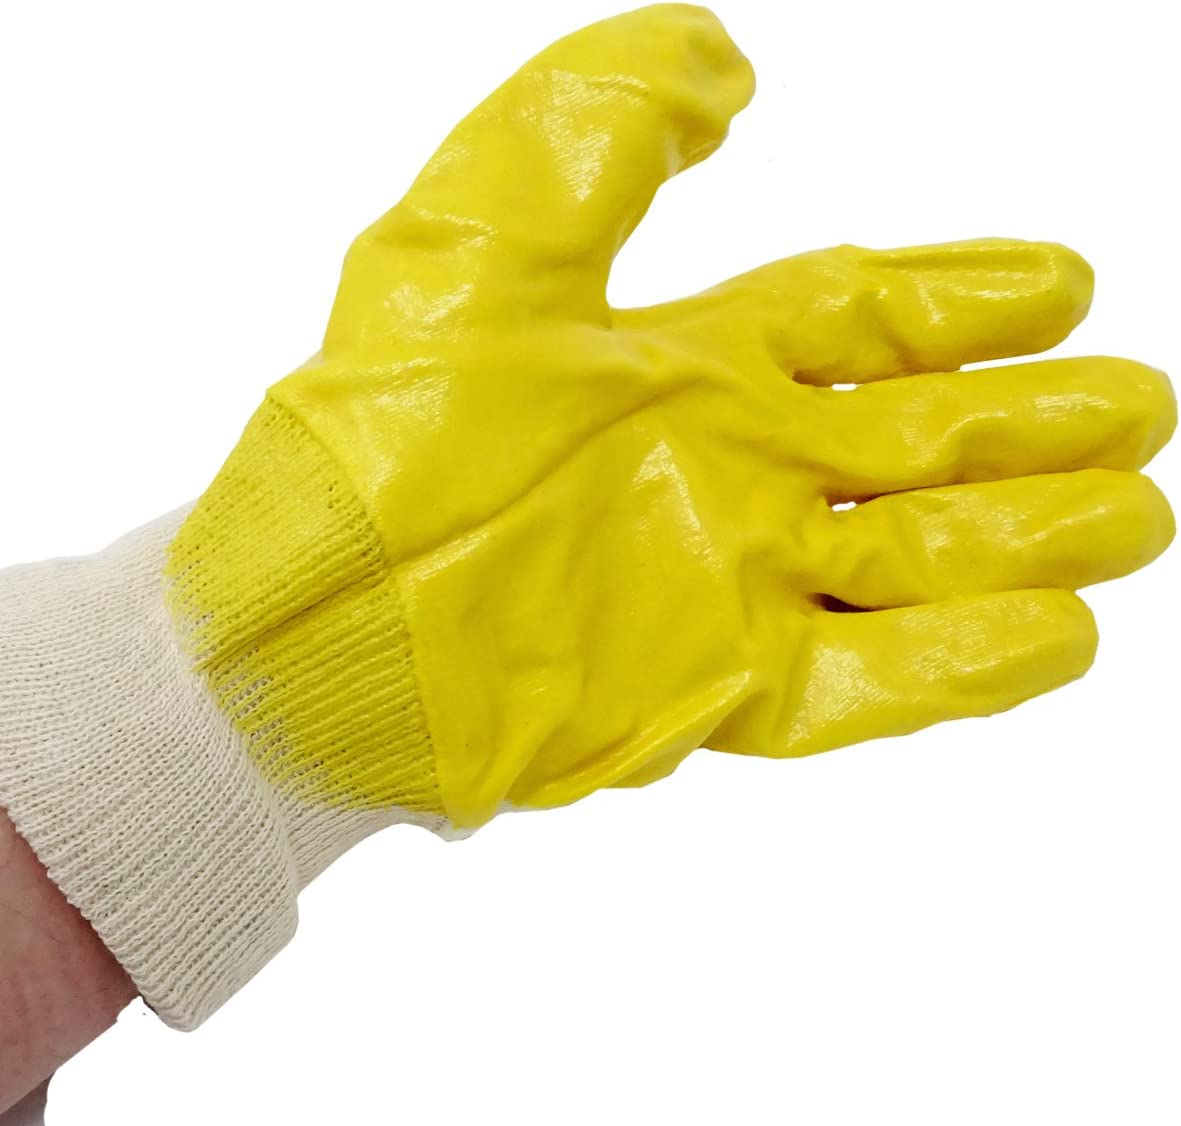 SBS/® Guantes de nitrilo Talla 7/Amarillo con pu/ño de 12/Pares de